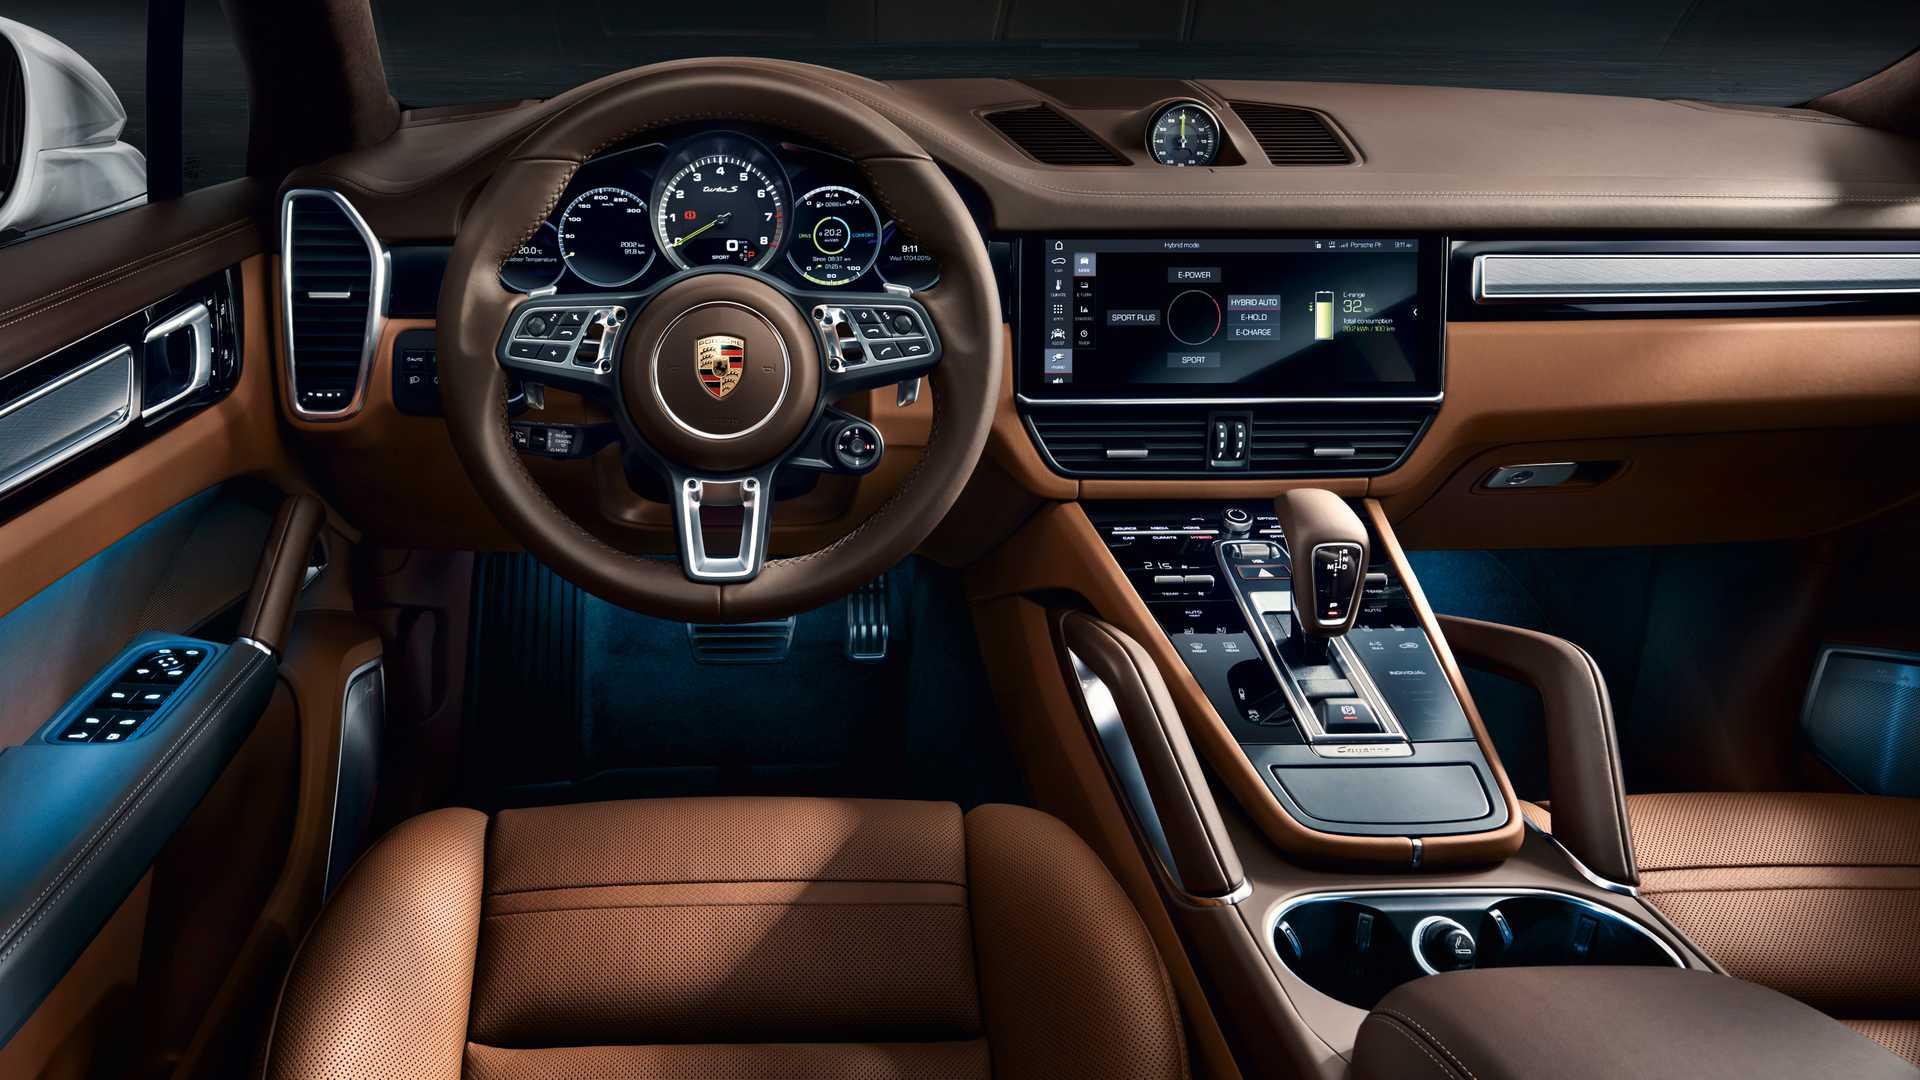 2020-porsche-cayenne-turbo-s-e-hybrid-coupe-turbo-s-e-hybrid-and-coupe-e-hybrid-9